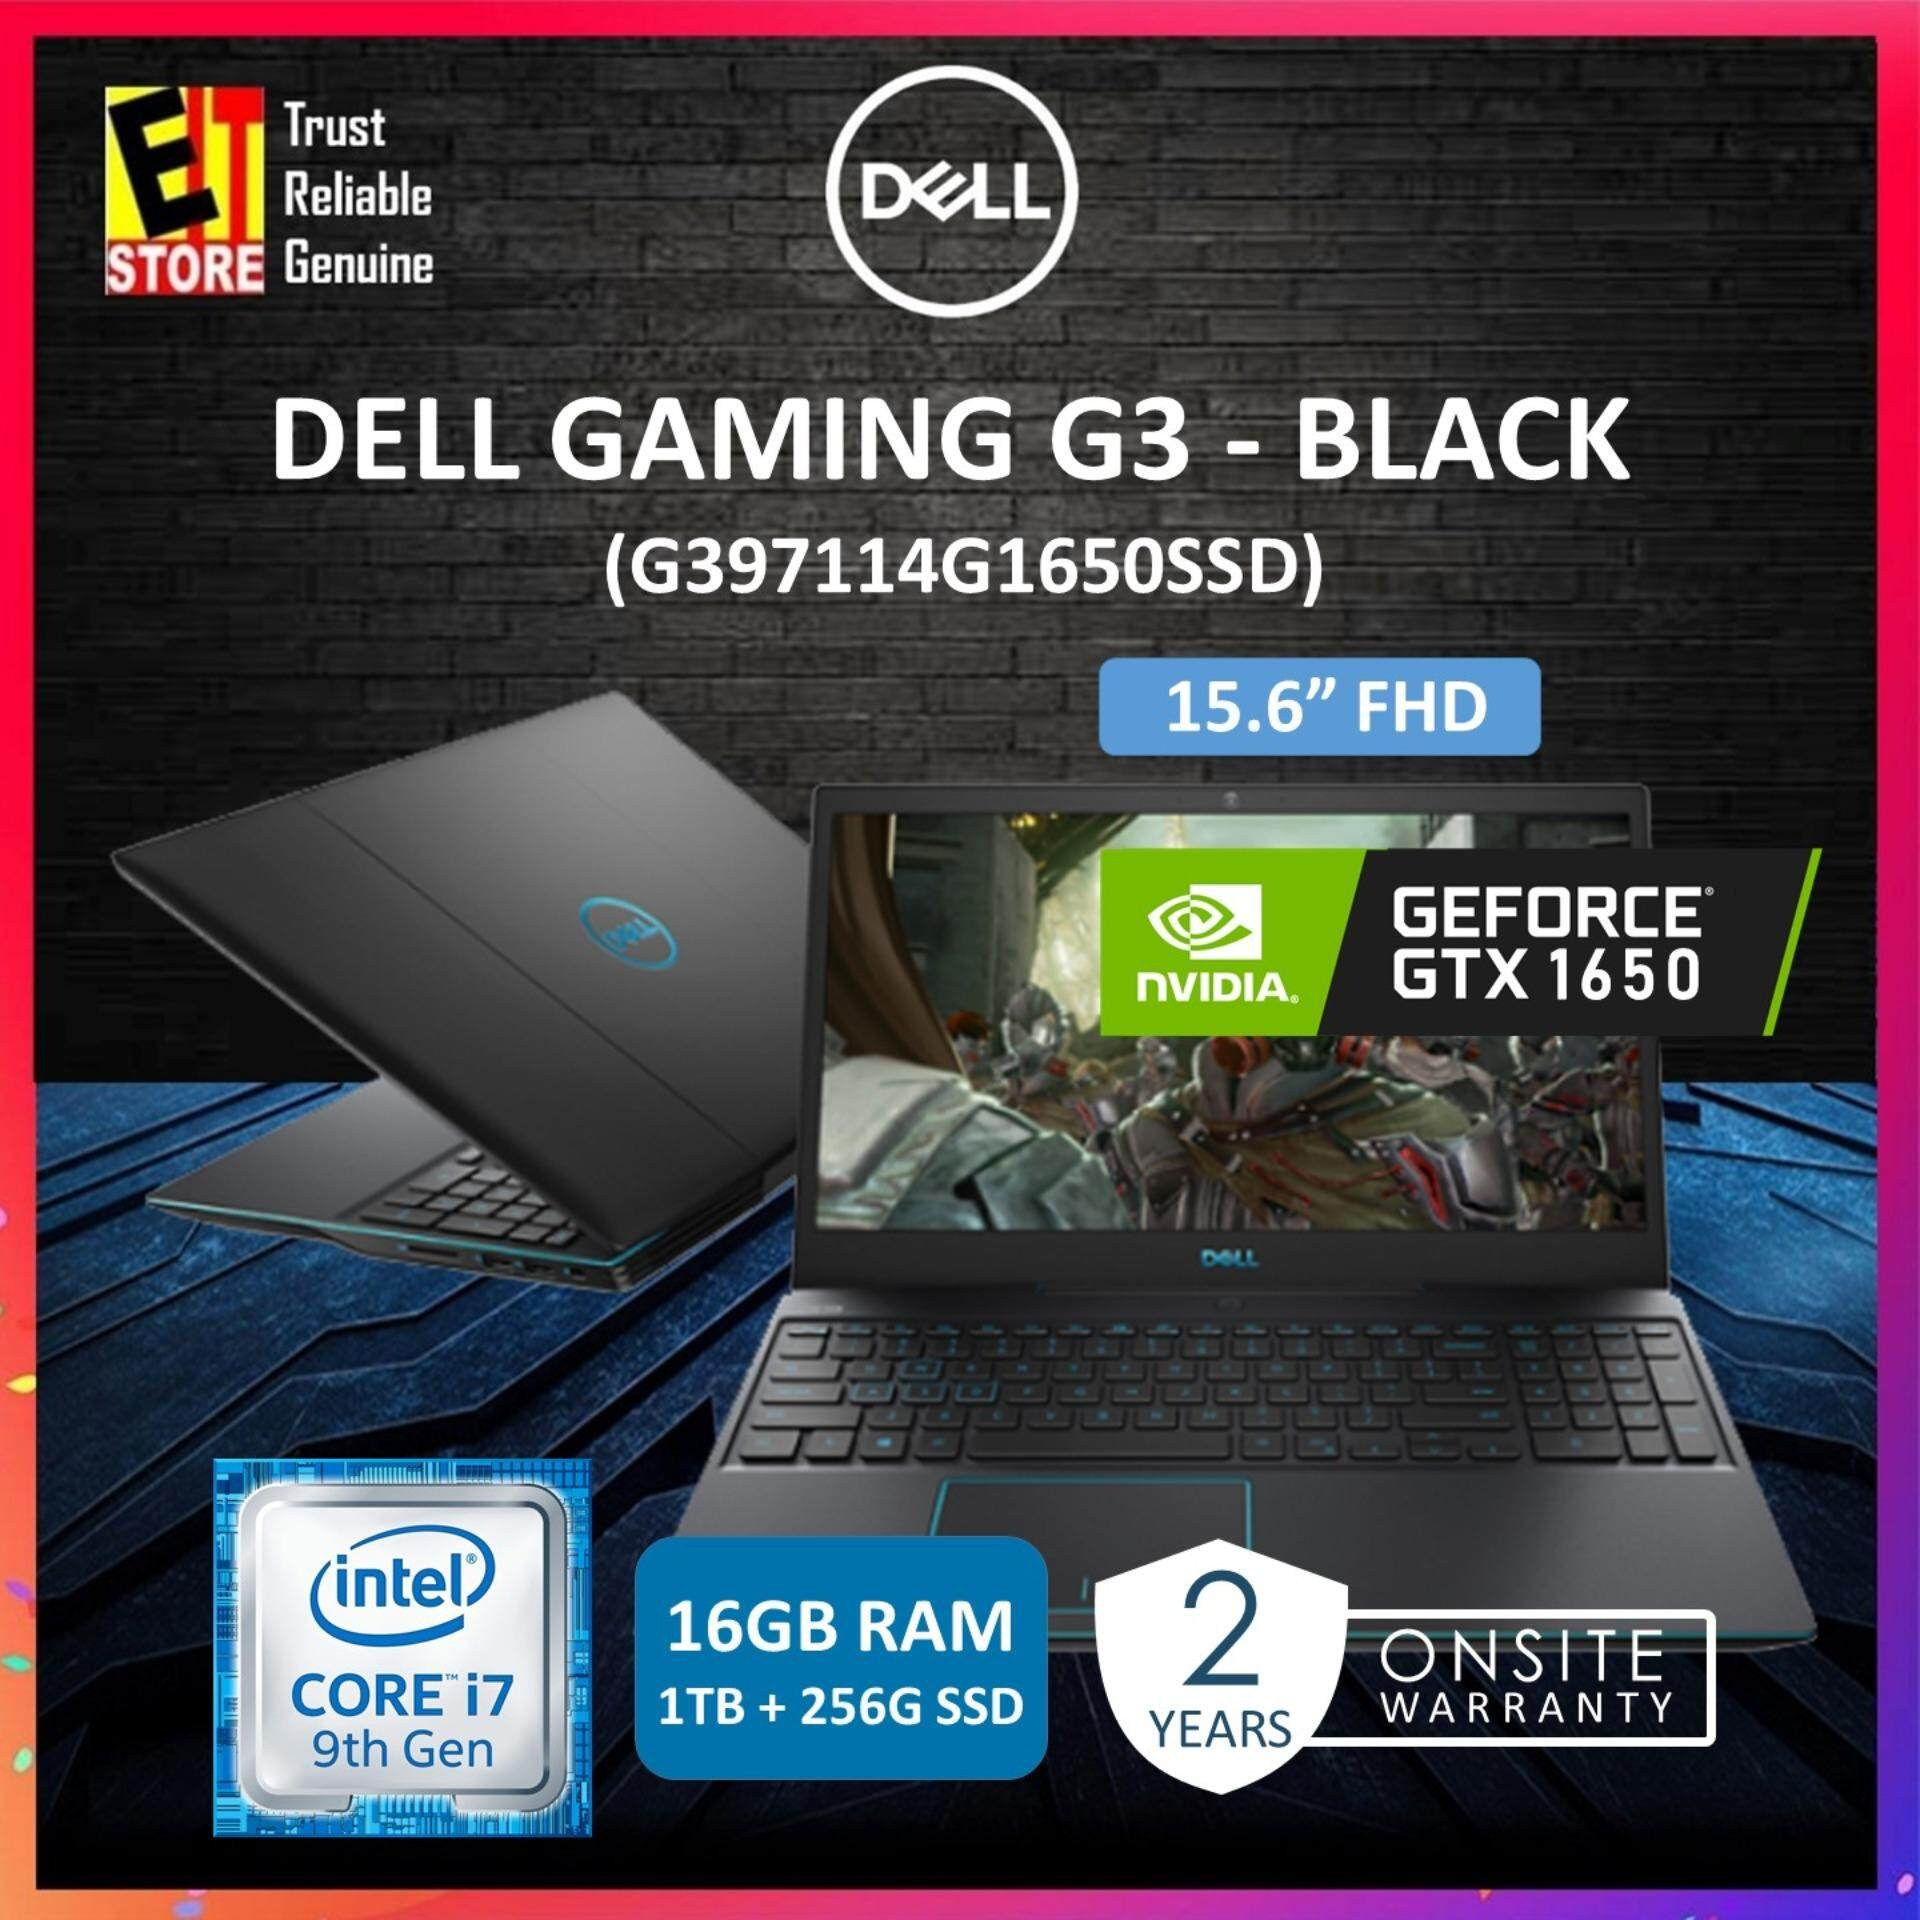 DELL GAMING G3 BLACK (G397114G1650SSD) (I7-9750H/16GB/1TB+256GB SSD/15.6FHD/4GB GTX 1650/W10/2YRS) Malaysia